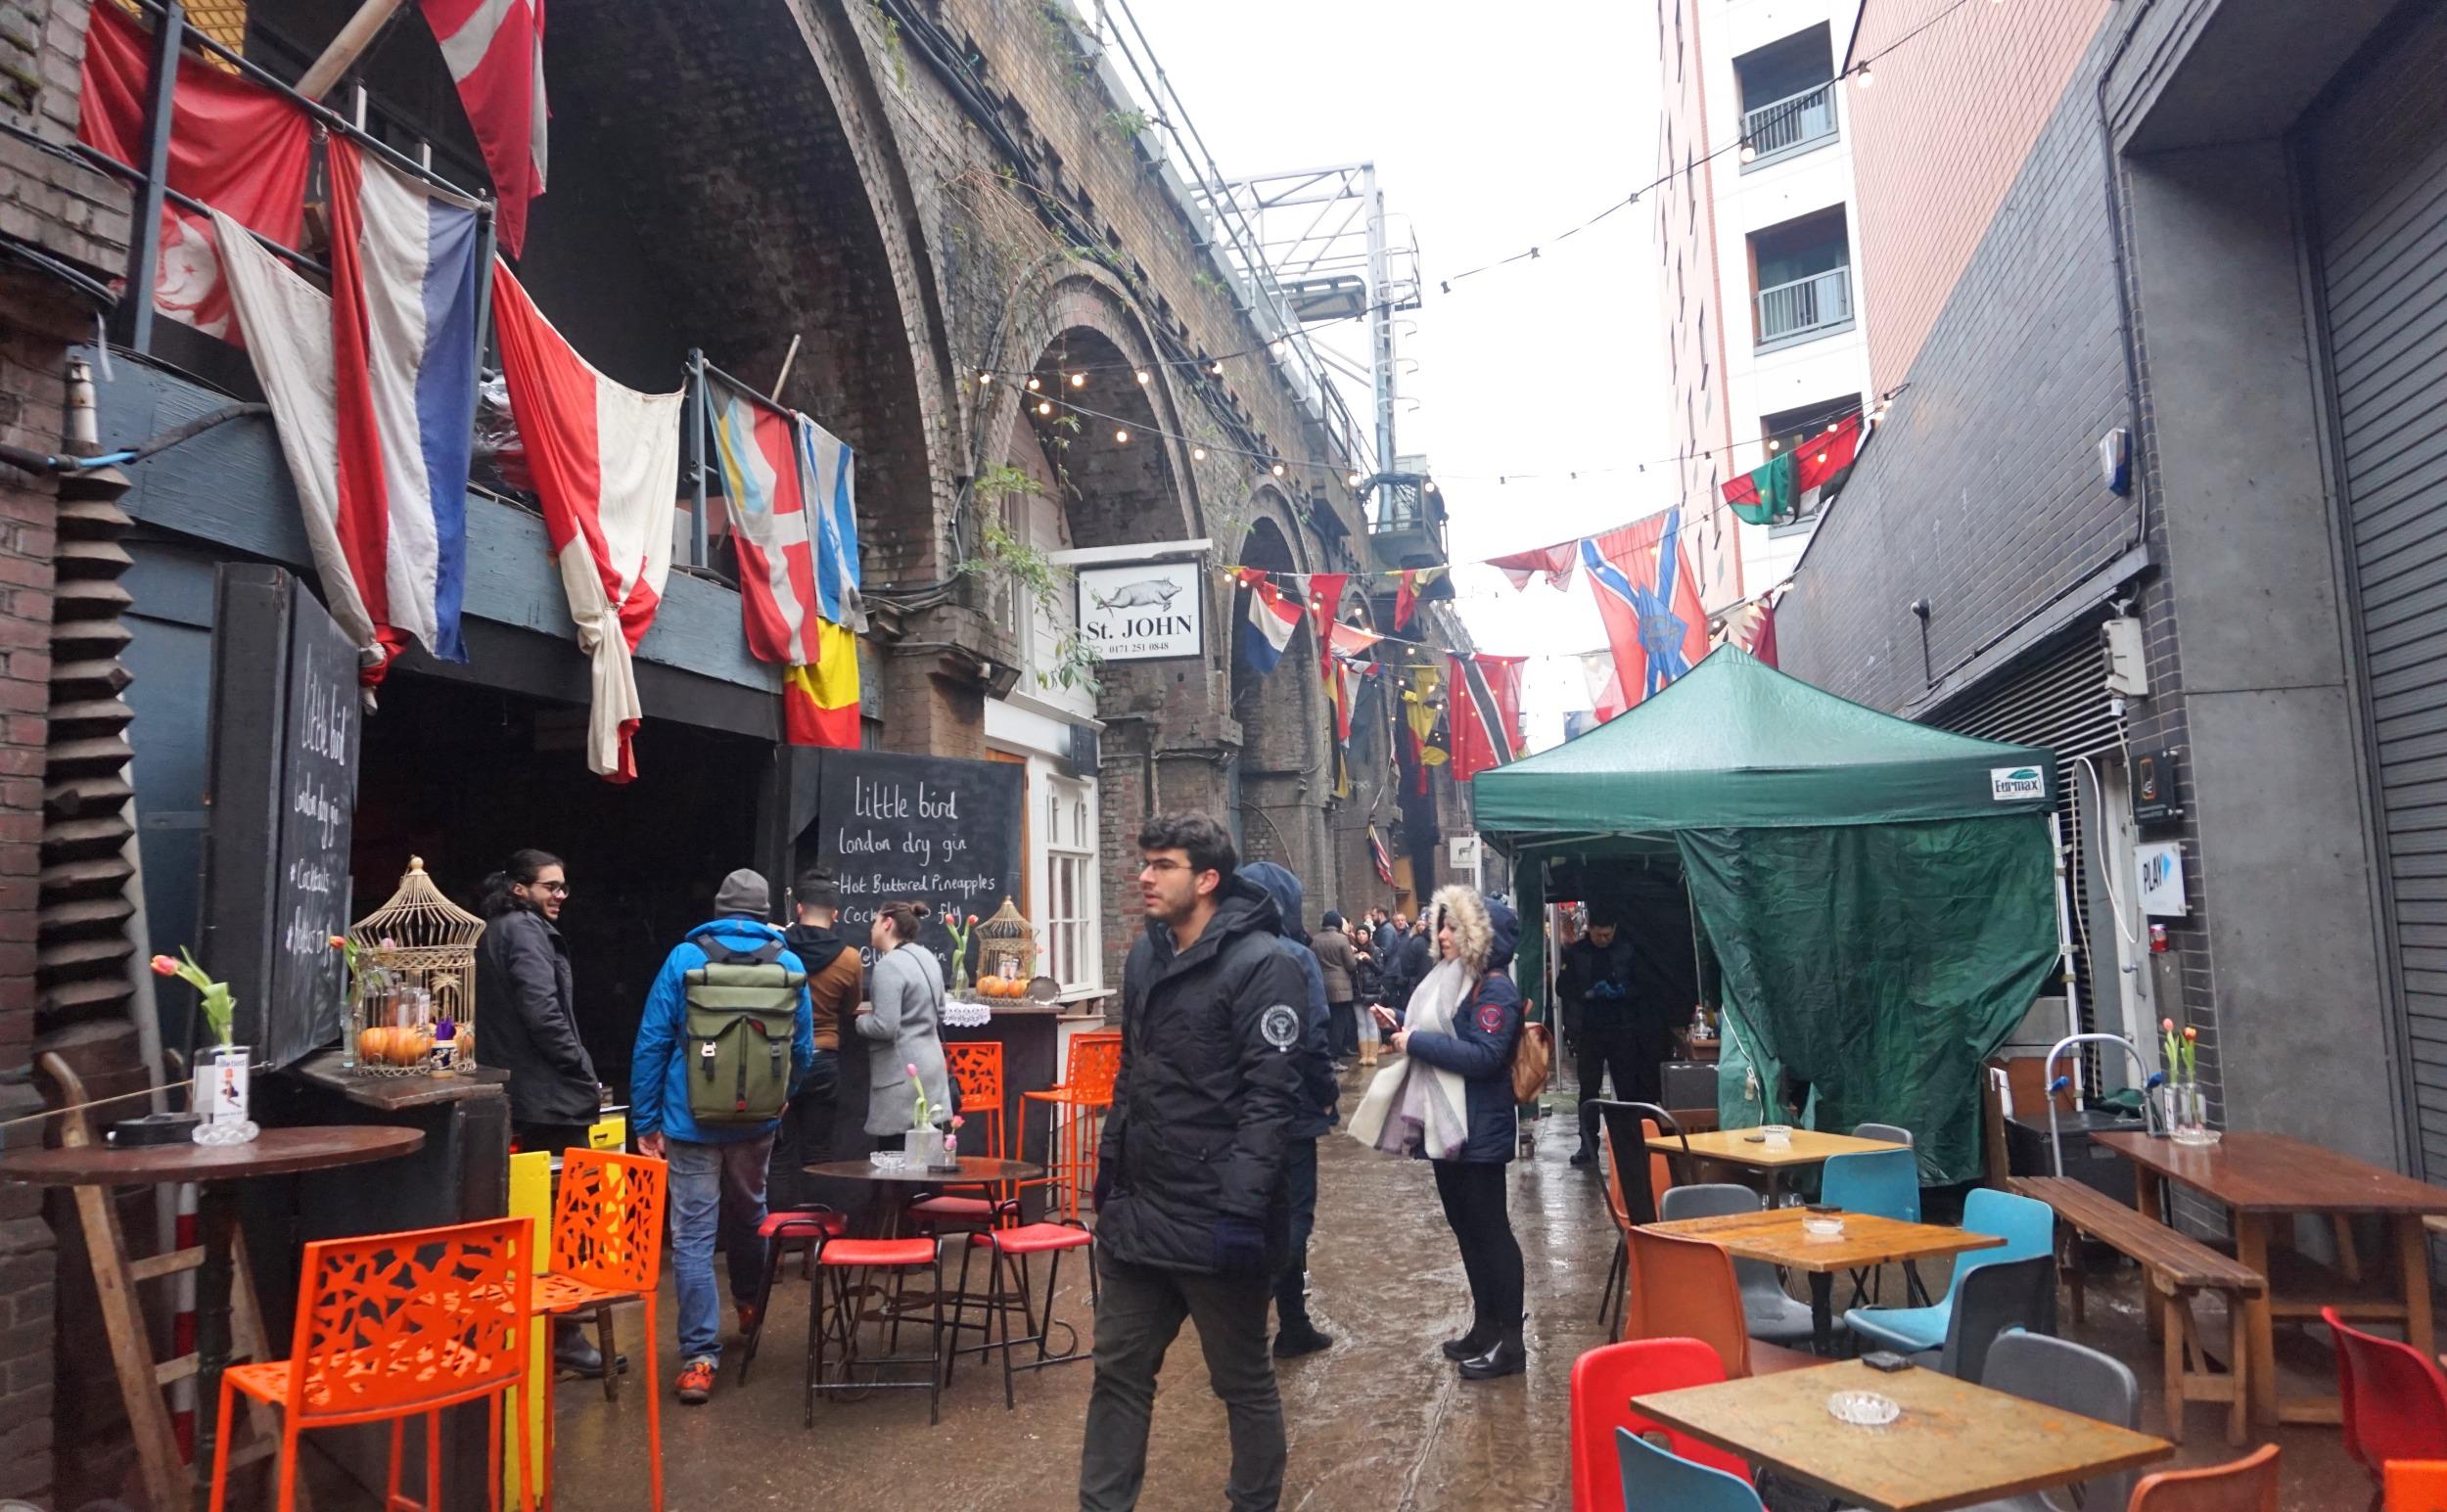 maltby-street-market-10